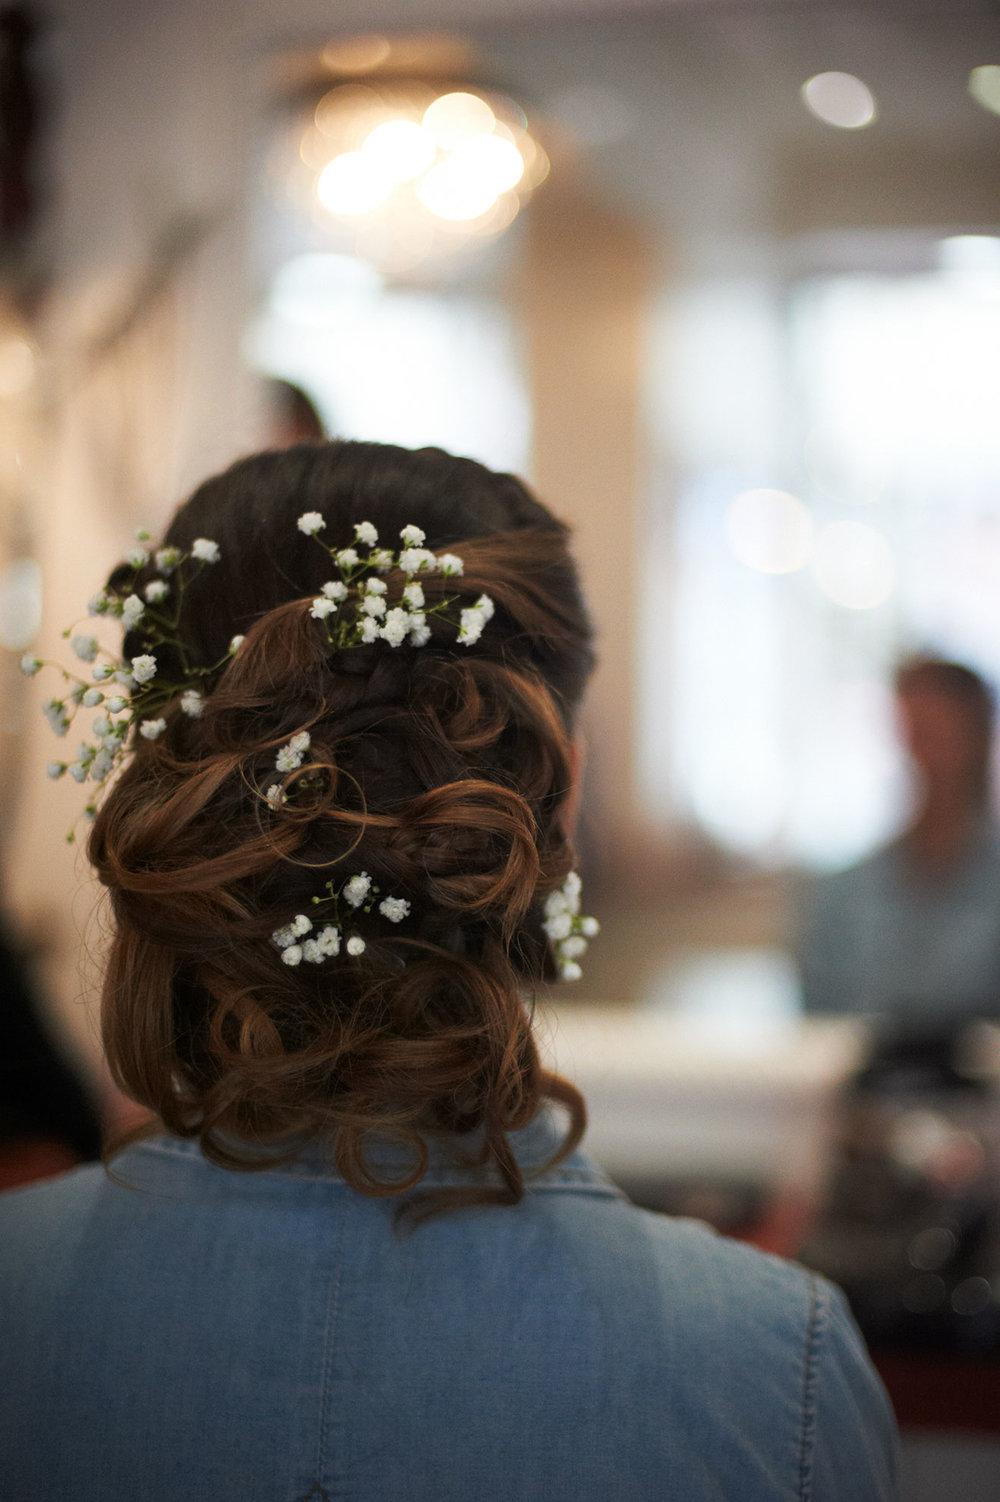 sarah_neale_photographe_mariage_09.jpg